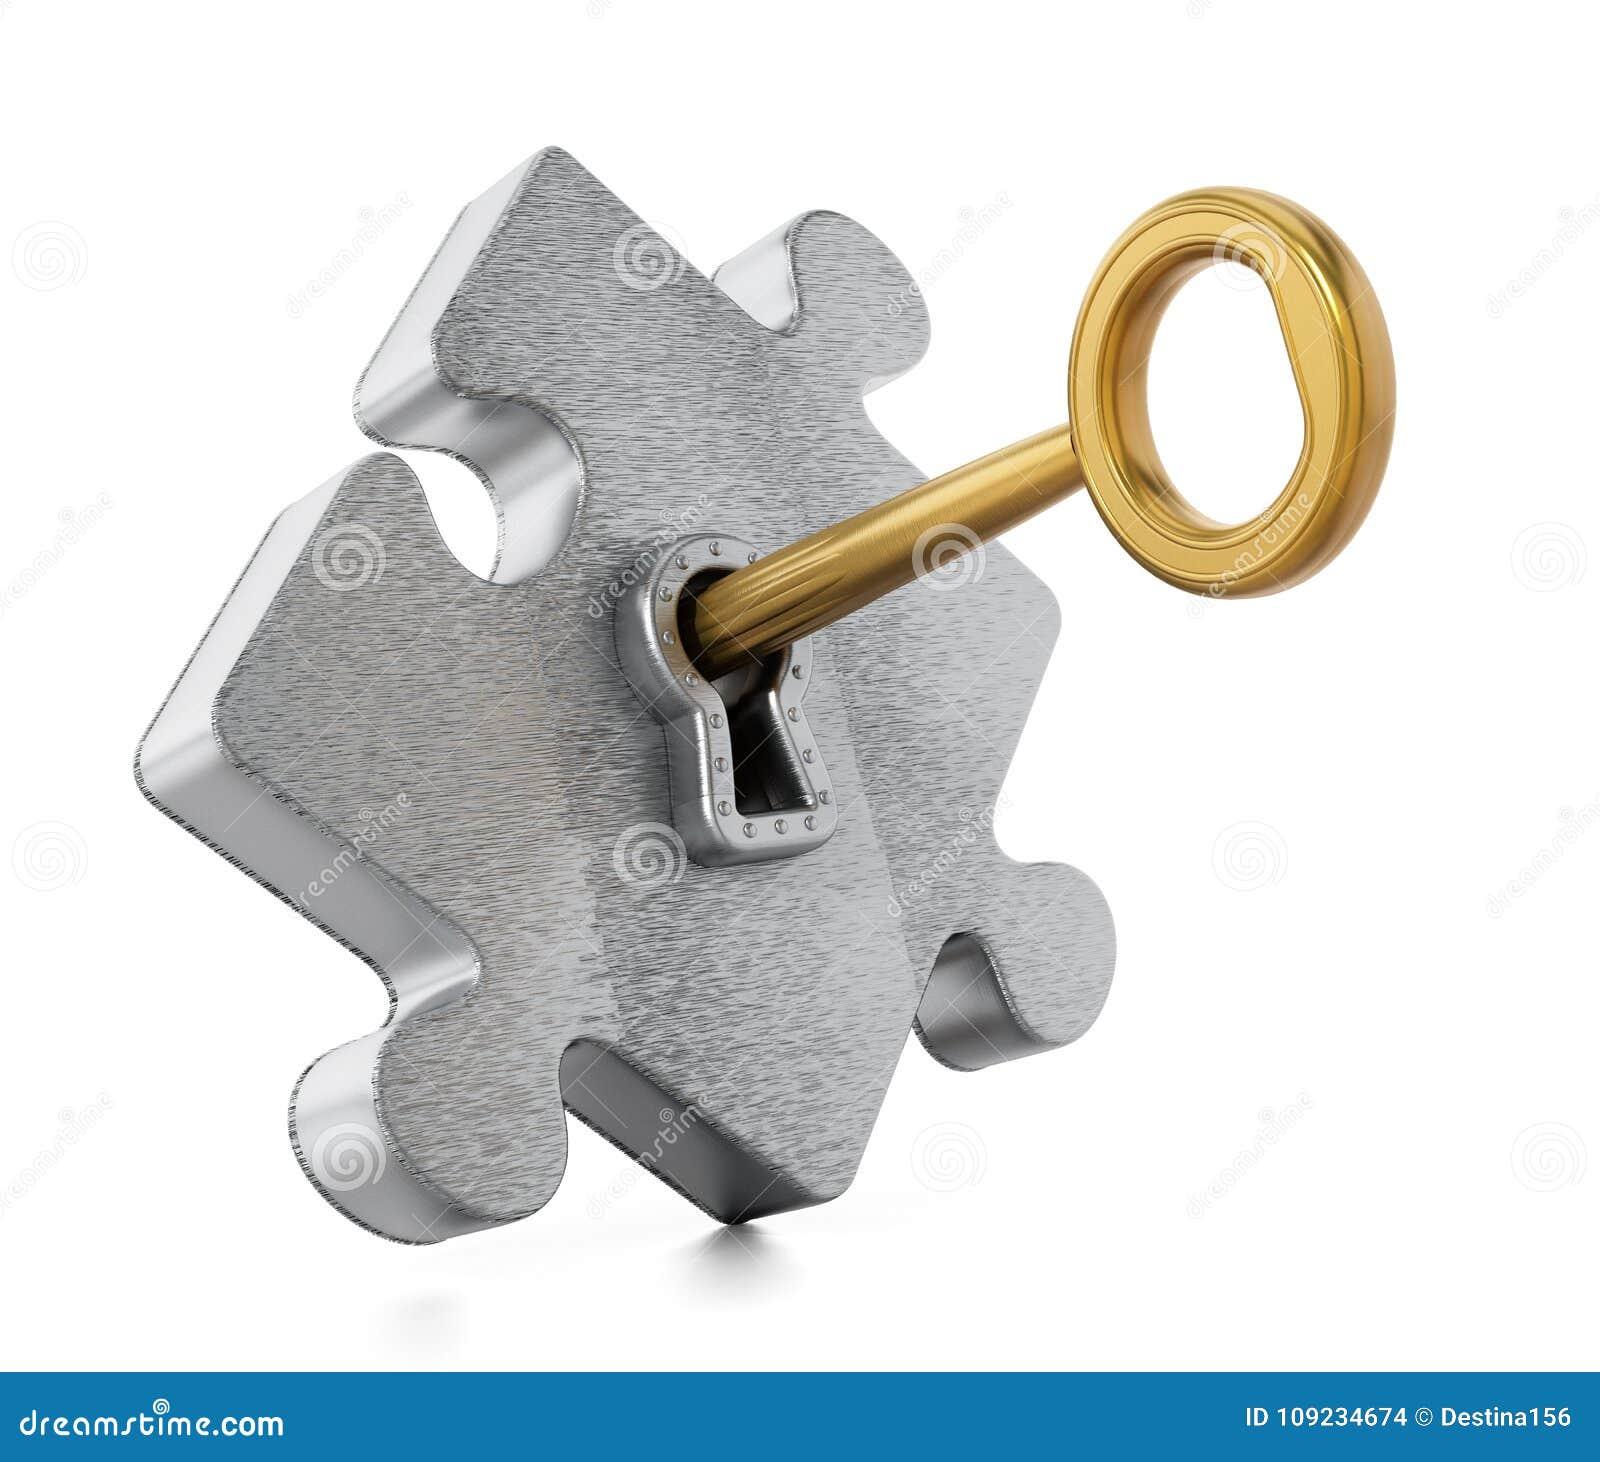 Golden Key Unlocking Metallic Puzzle Piece  3D Illustration Stock